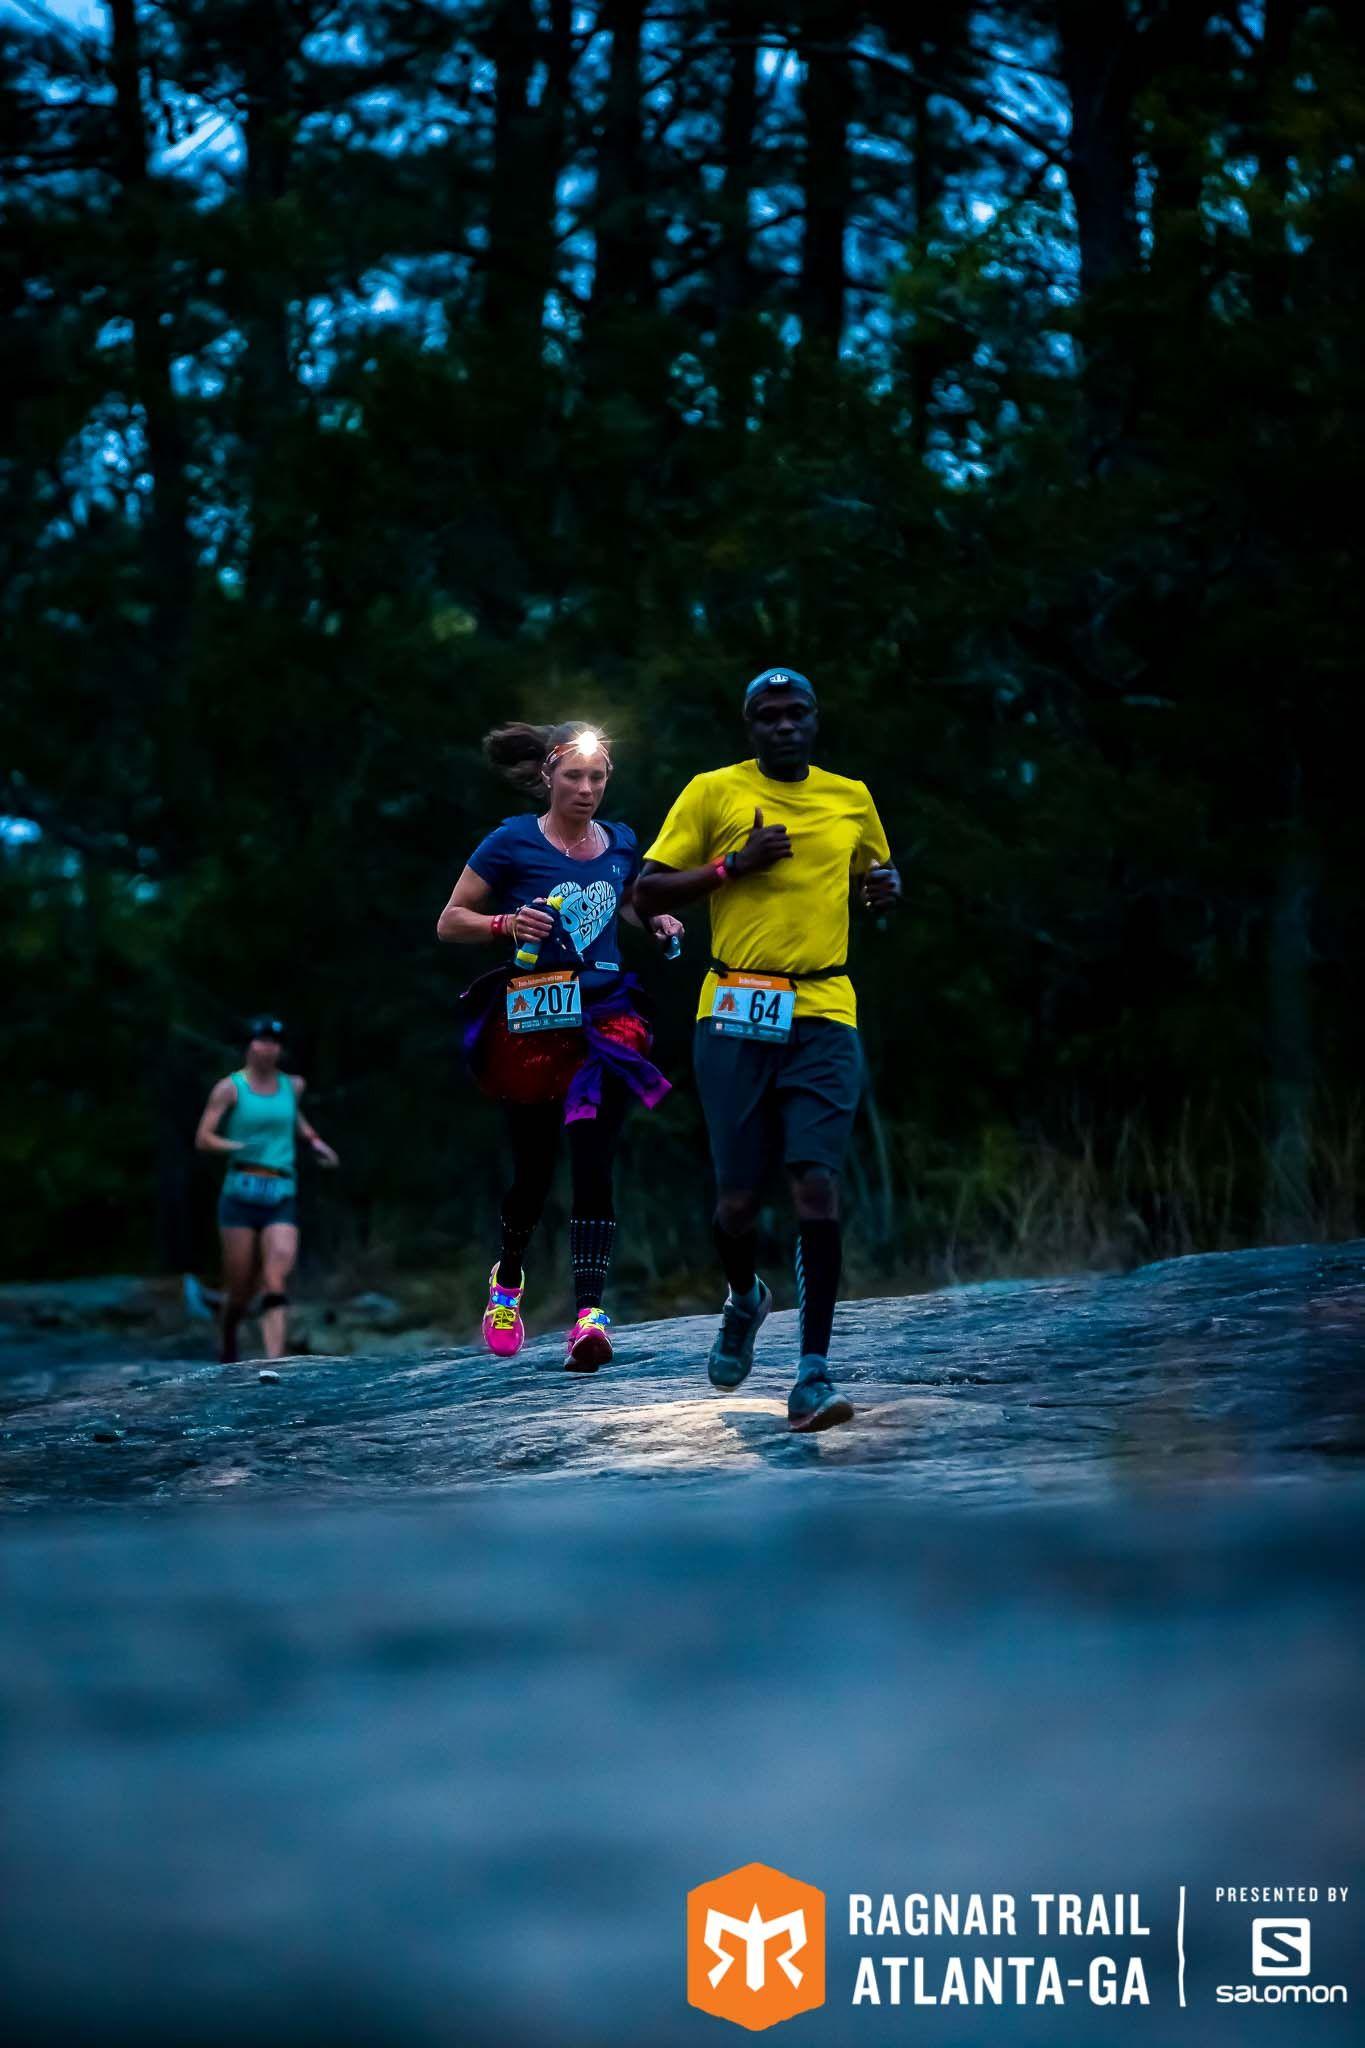 Run. Camp. Sleep? Repeat. At Ragnar Trail Atlanta - GA, presented by Salomon. April 21-22, 2017.